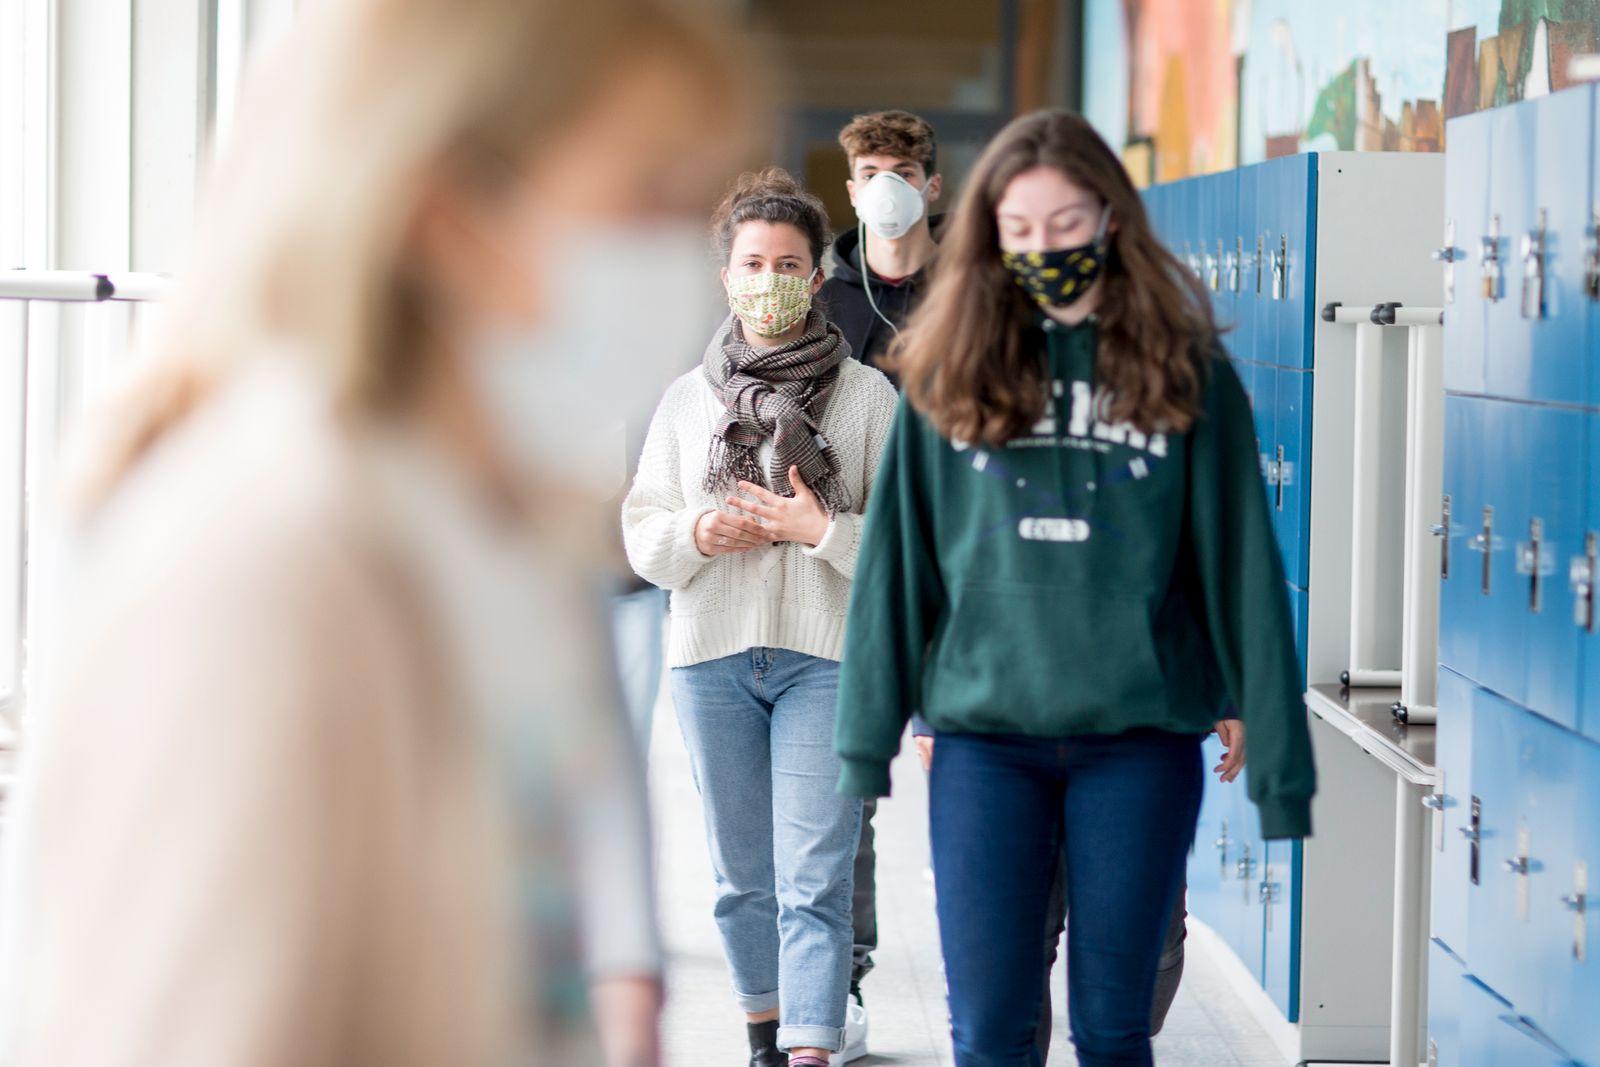 High School Students Return To School During The Coronavirus Crisis